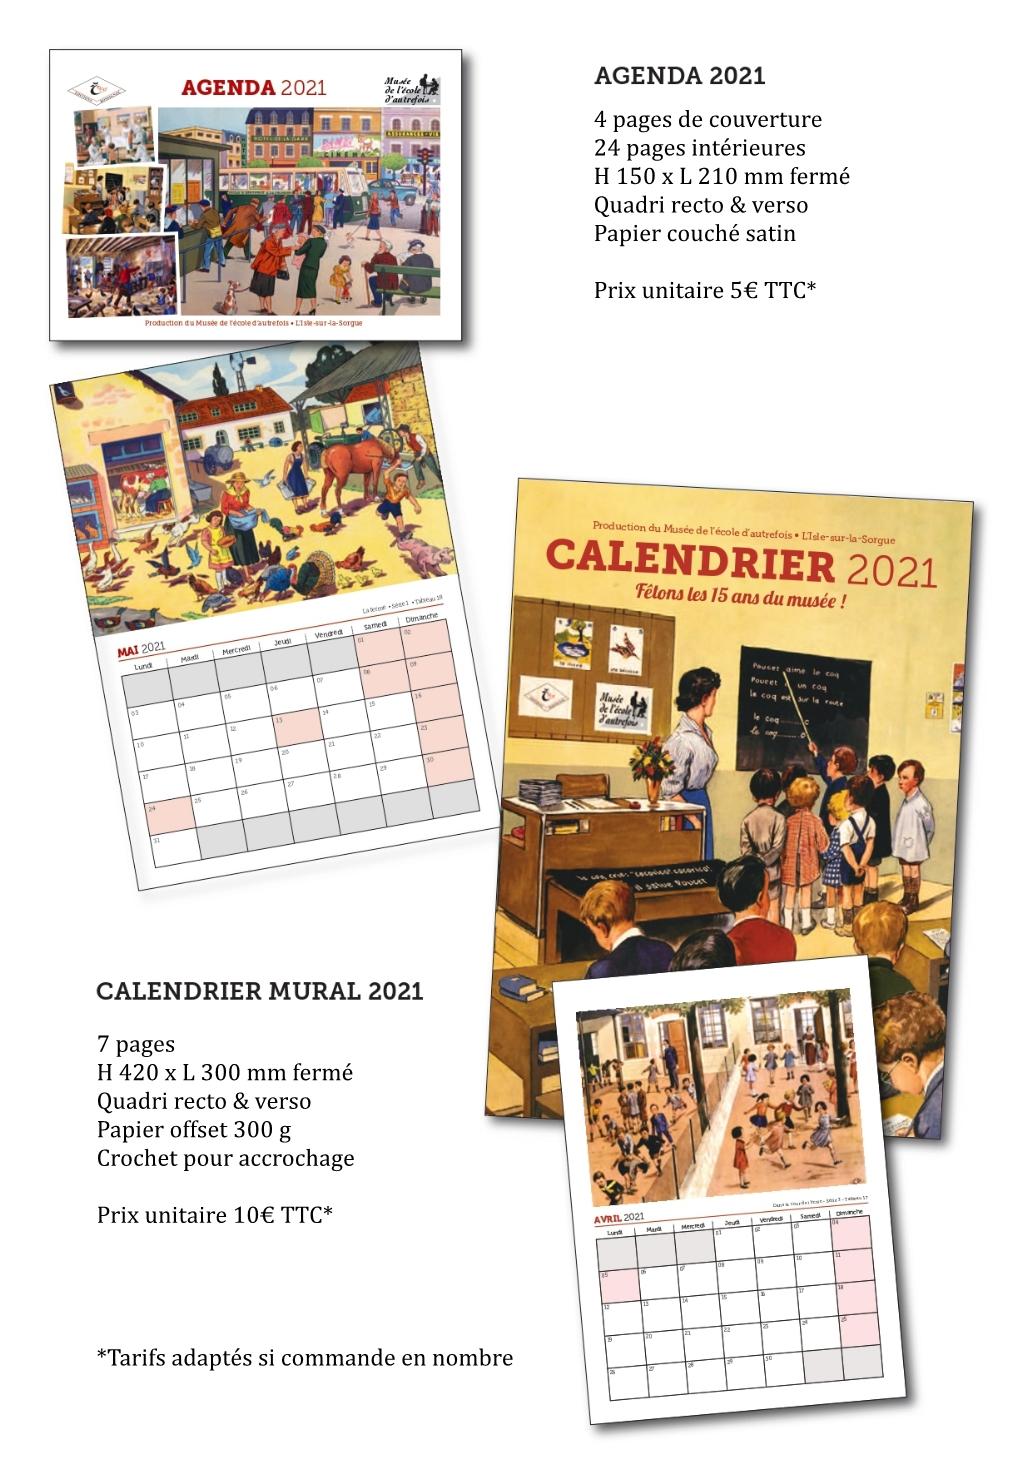 Agenda et calendrier mural 2021